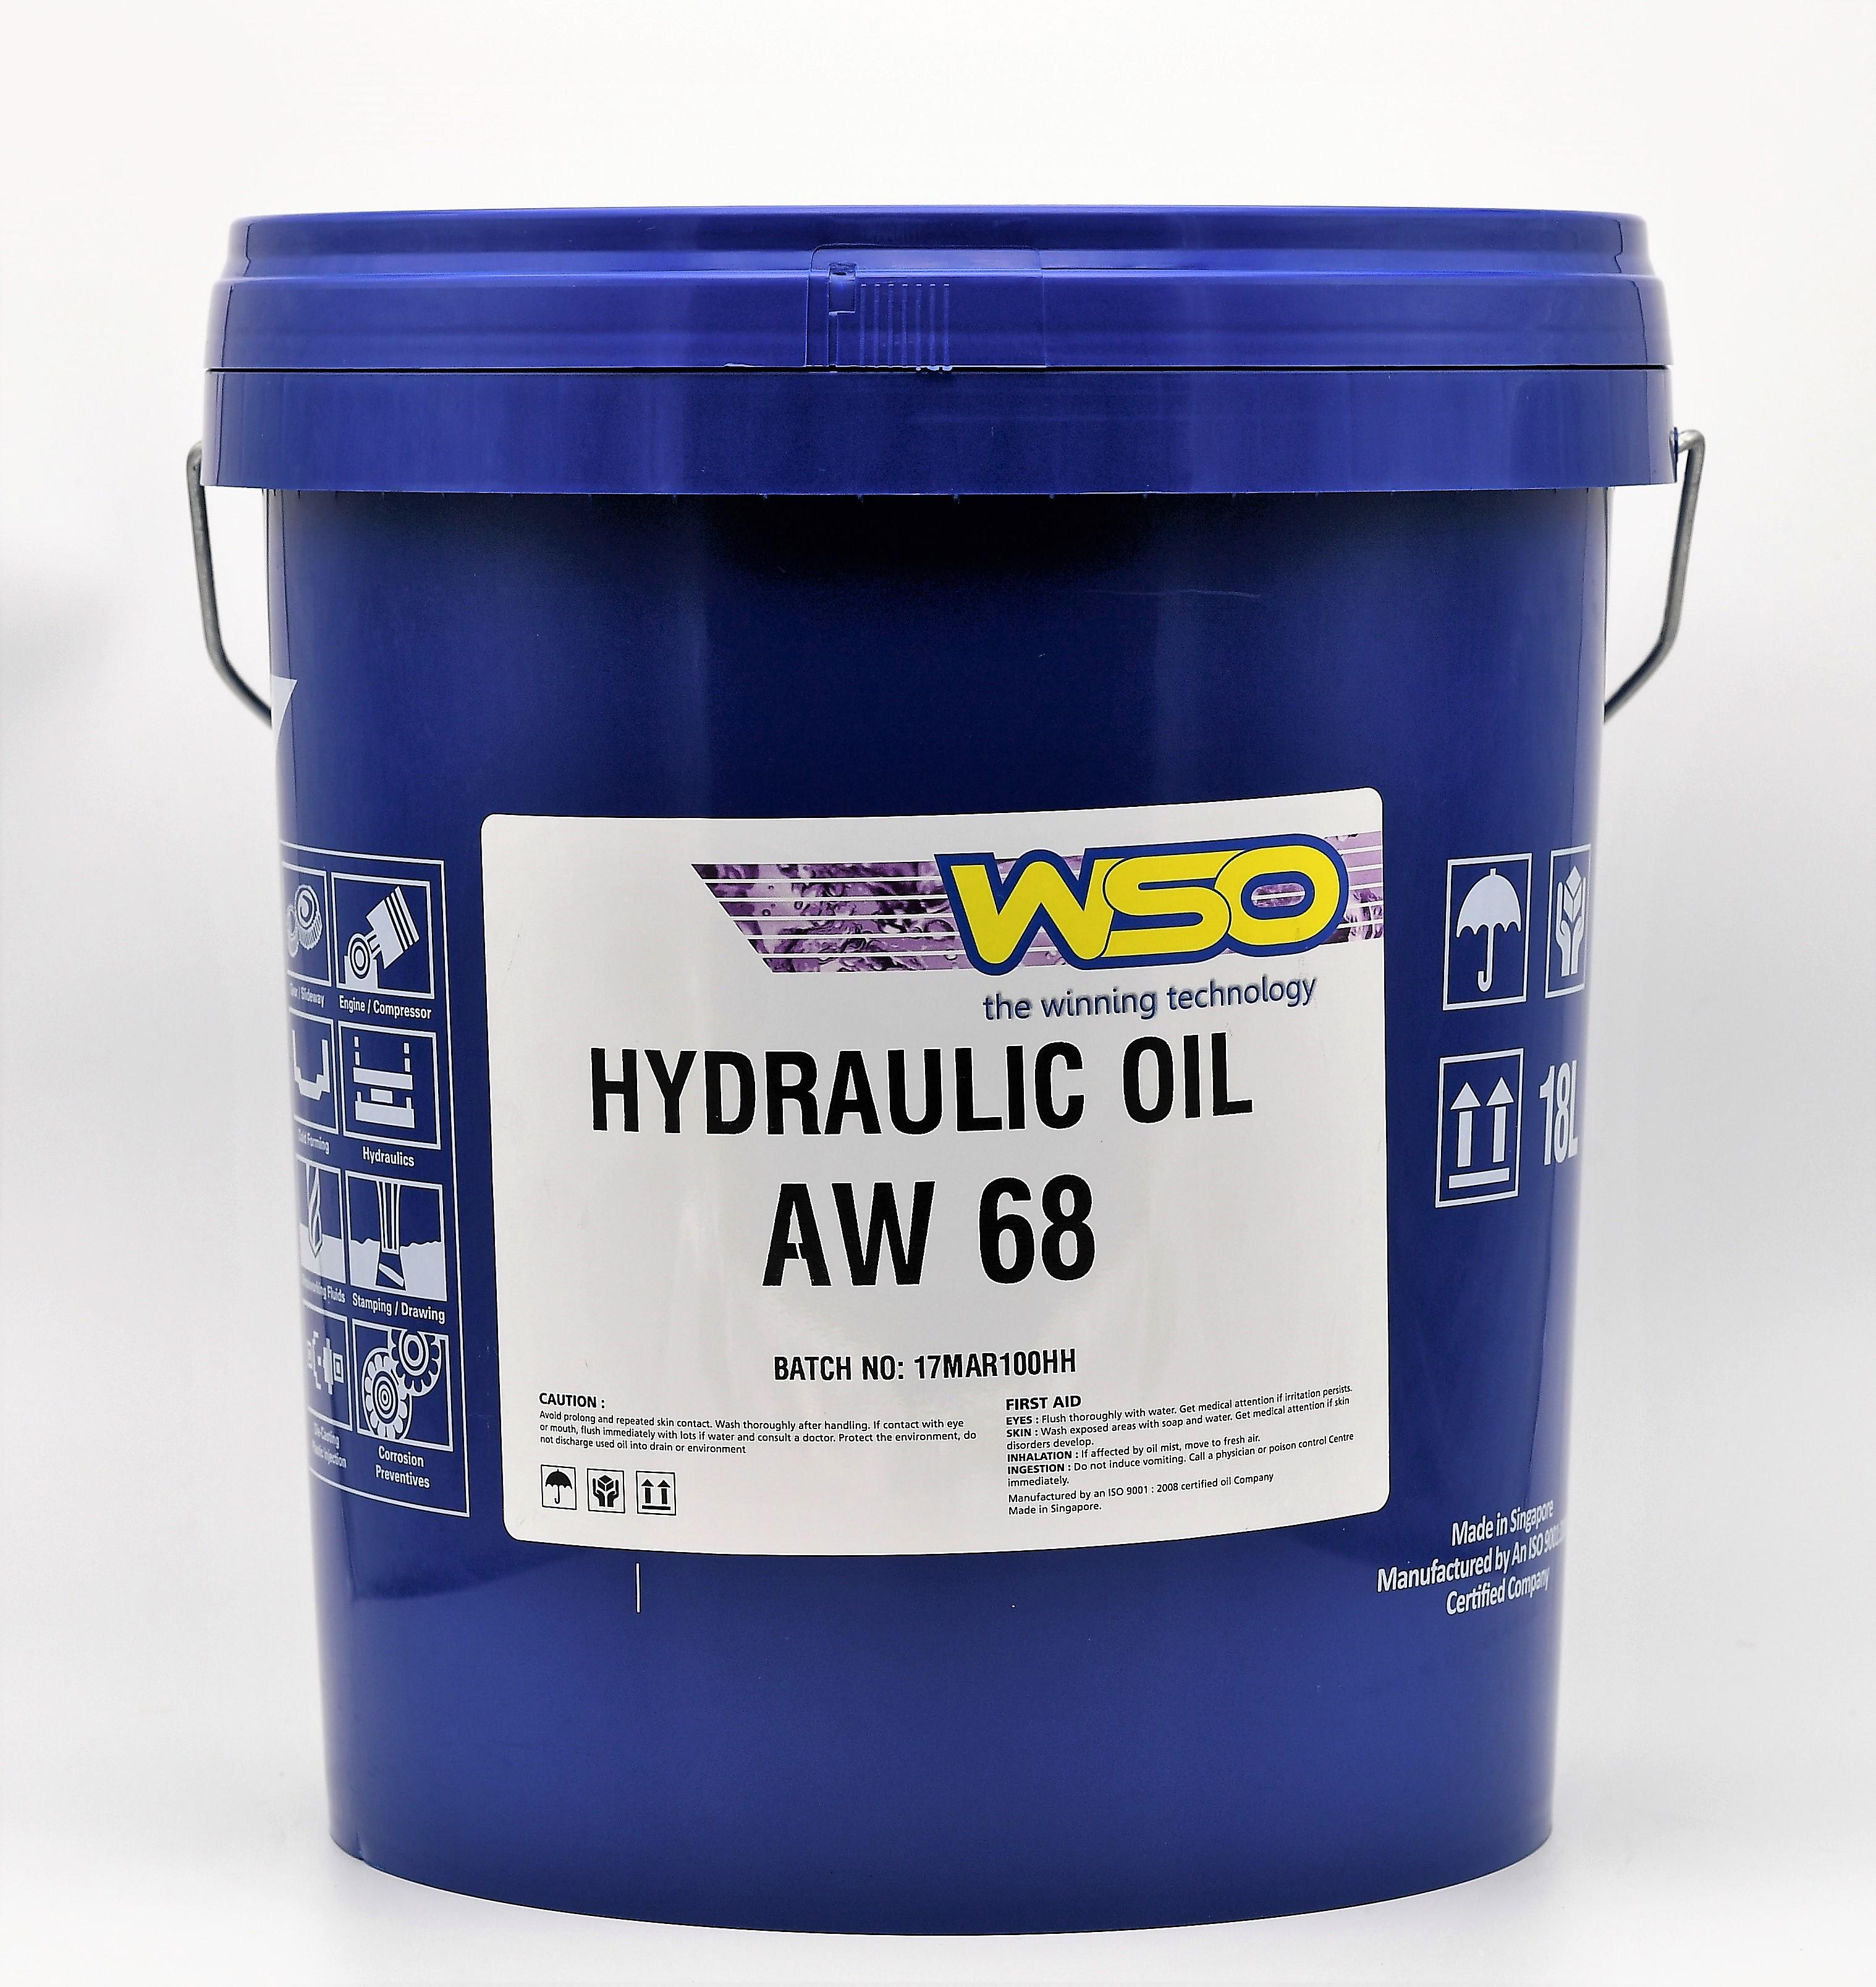 hydraruzxpnew4af-onion-product-128681